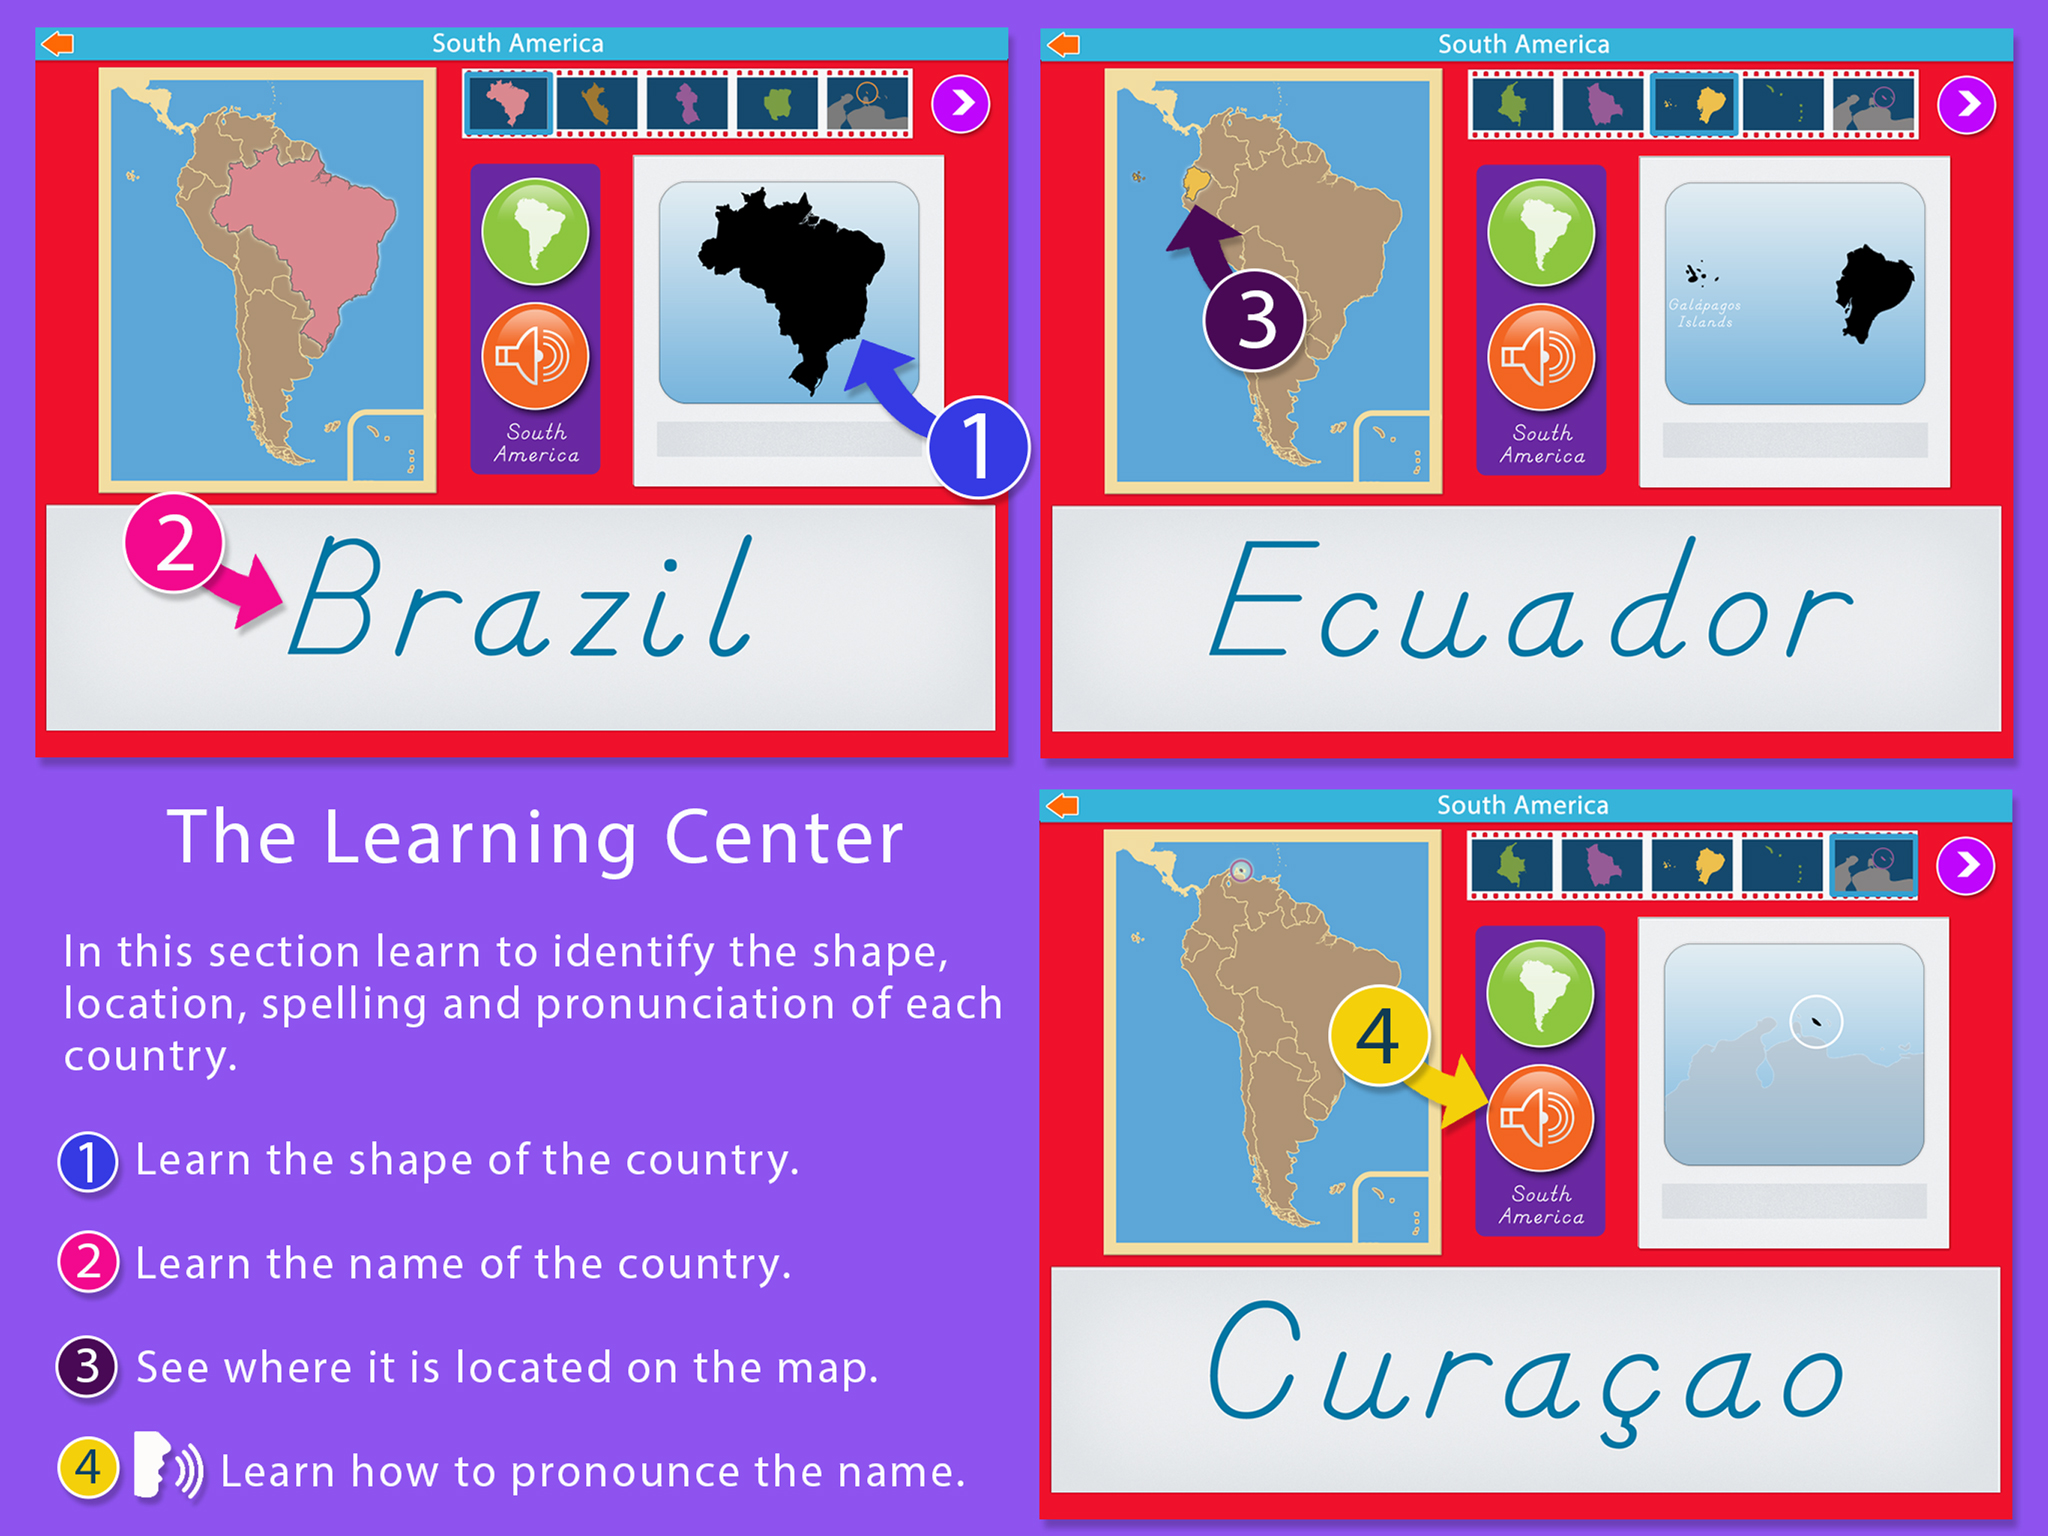 SouthAmericaGeographySouthAmericaGeography-reg.jpg